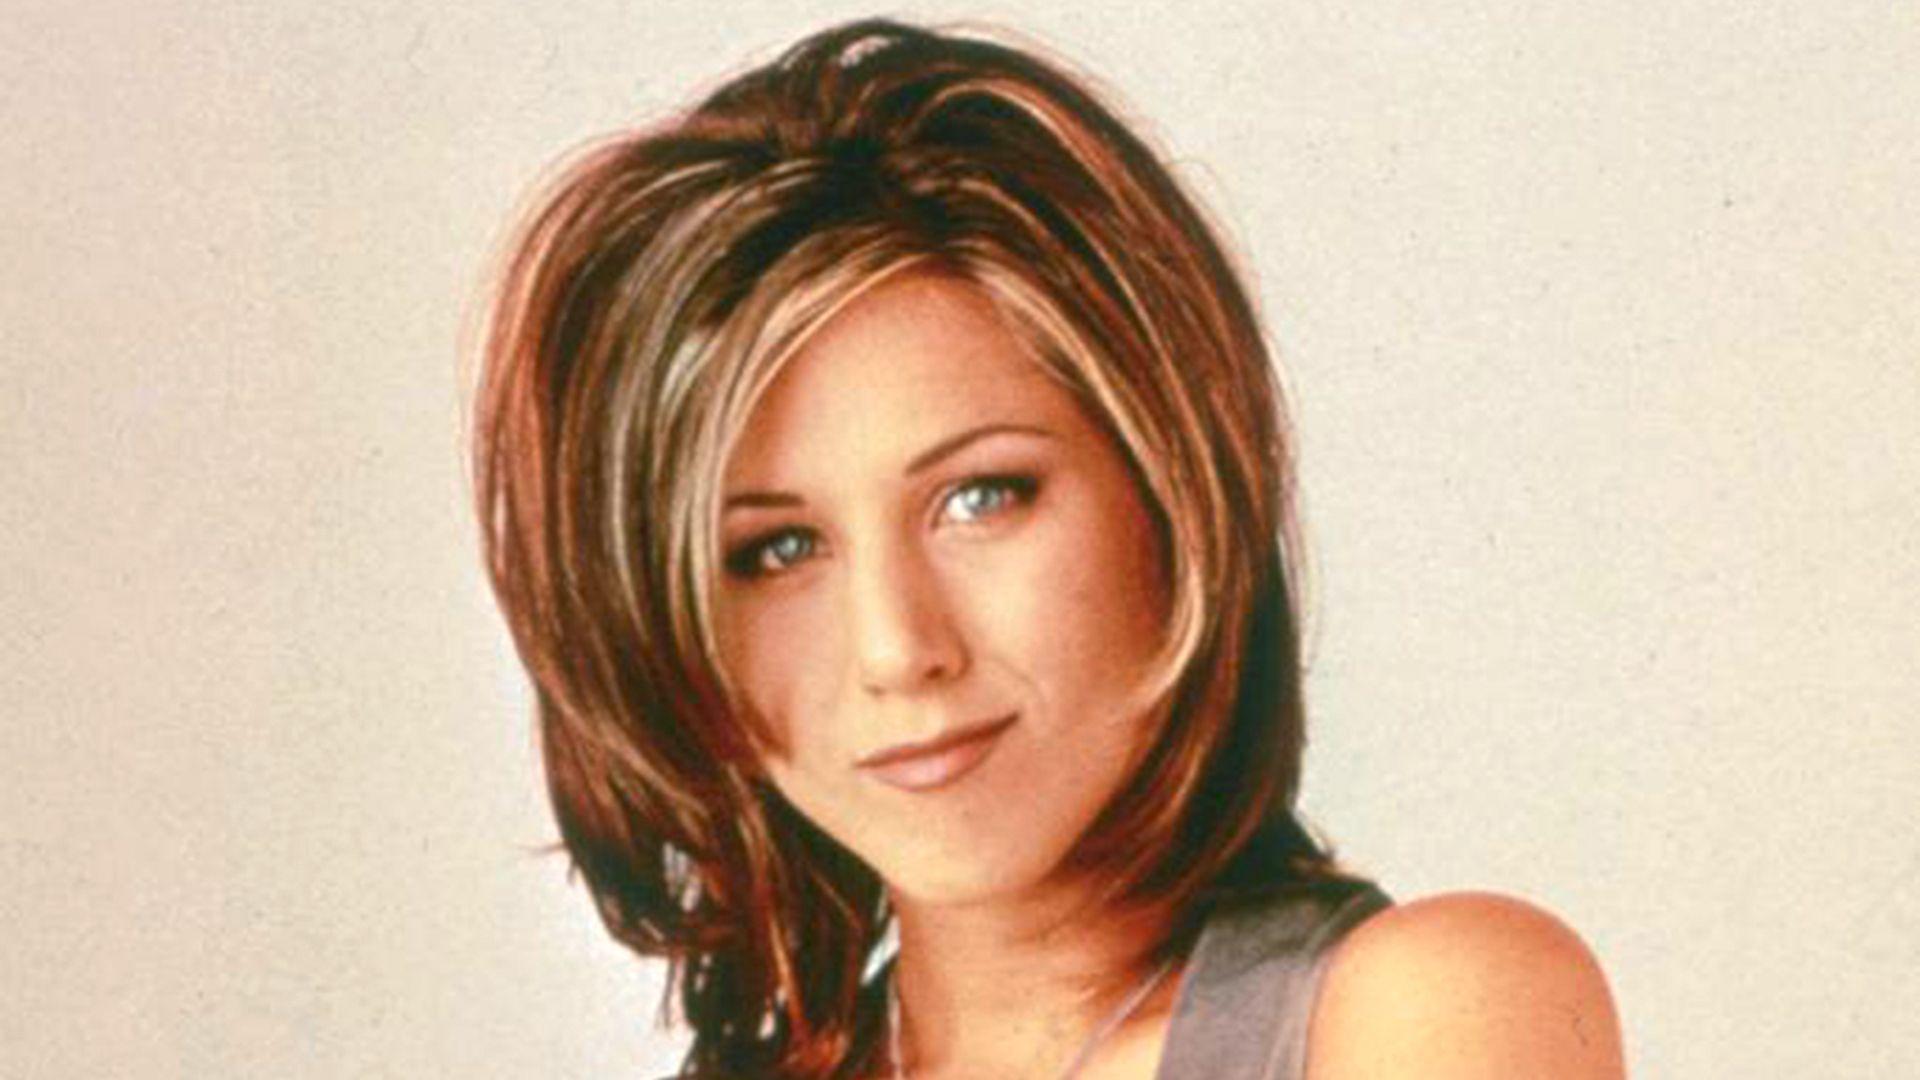 Jennifer Aniston reveals why she hated The Rachel haircut